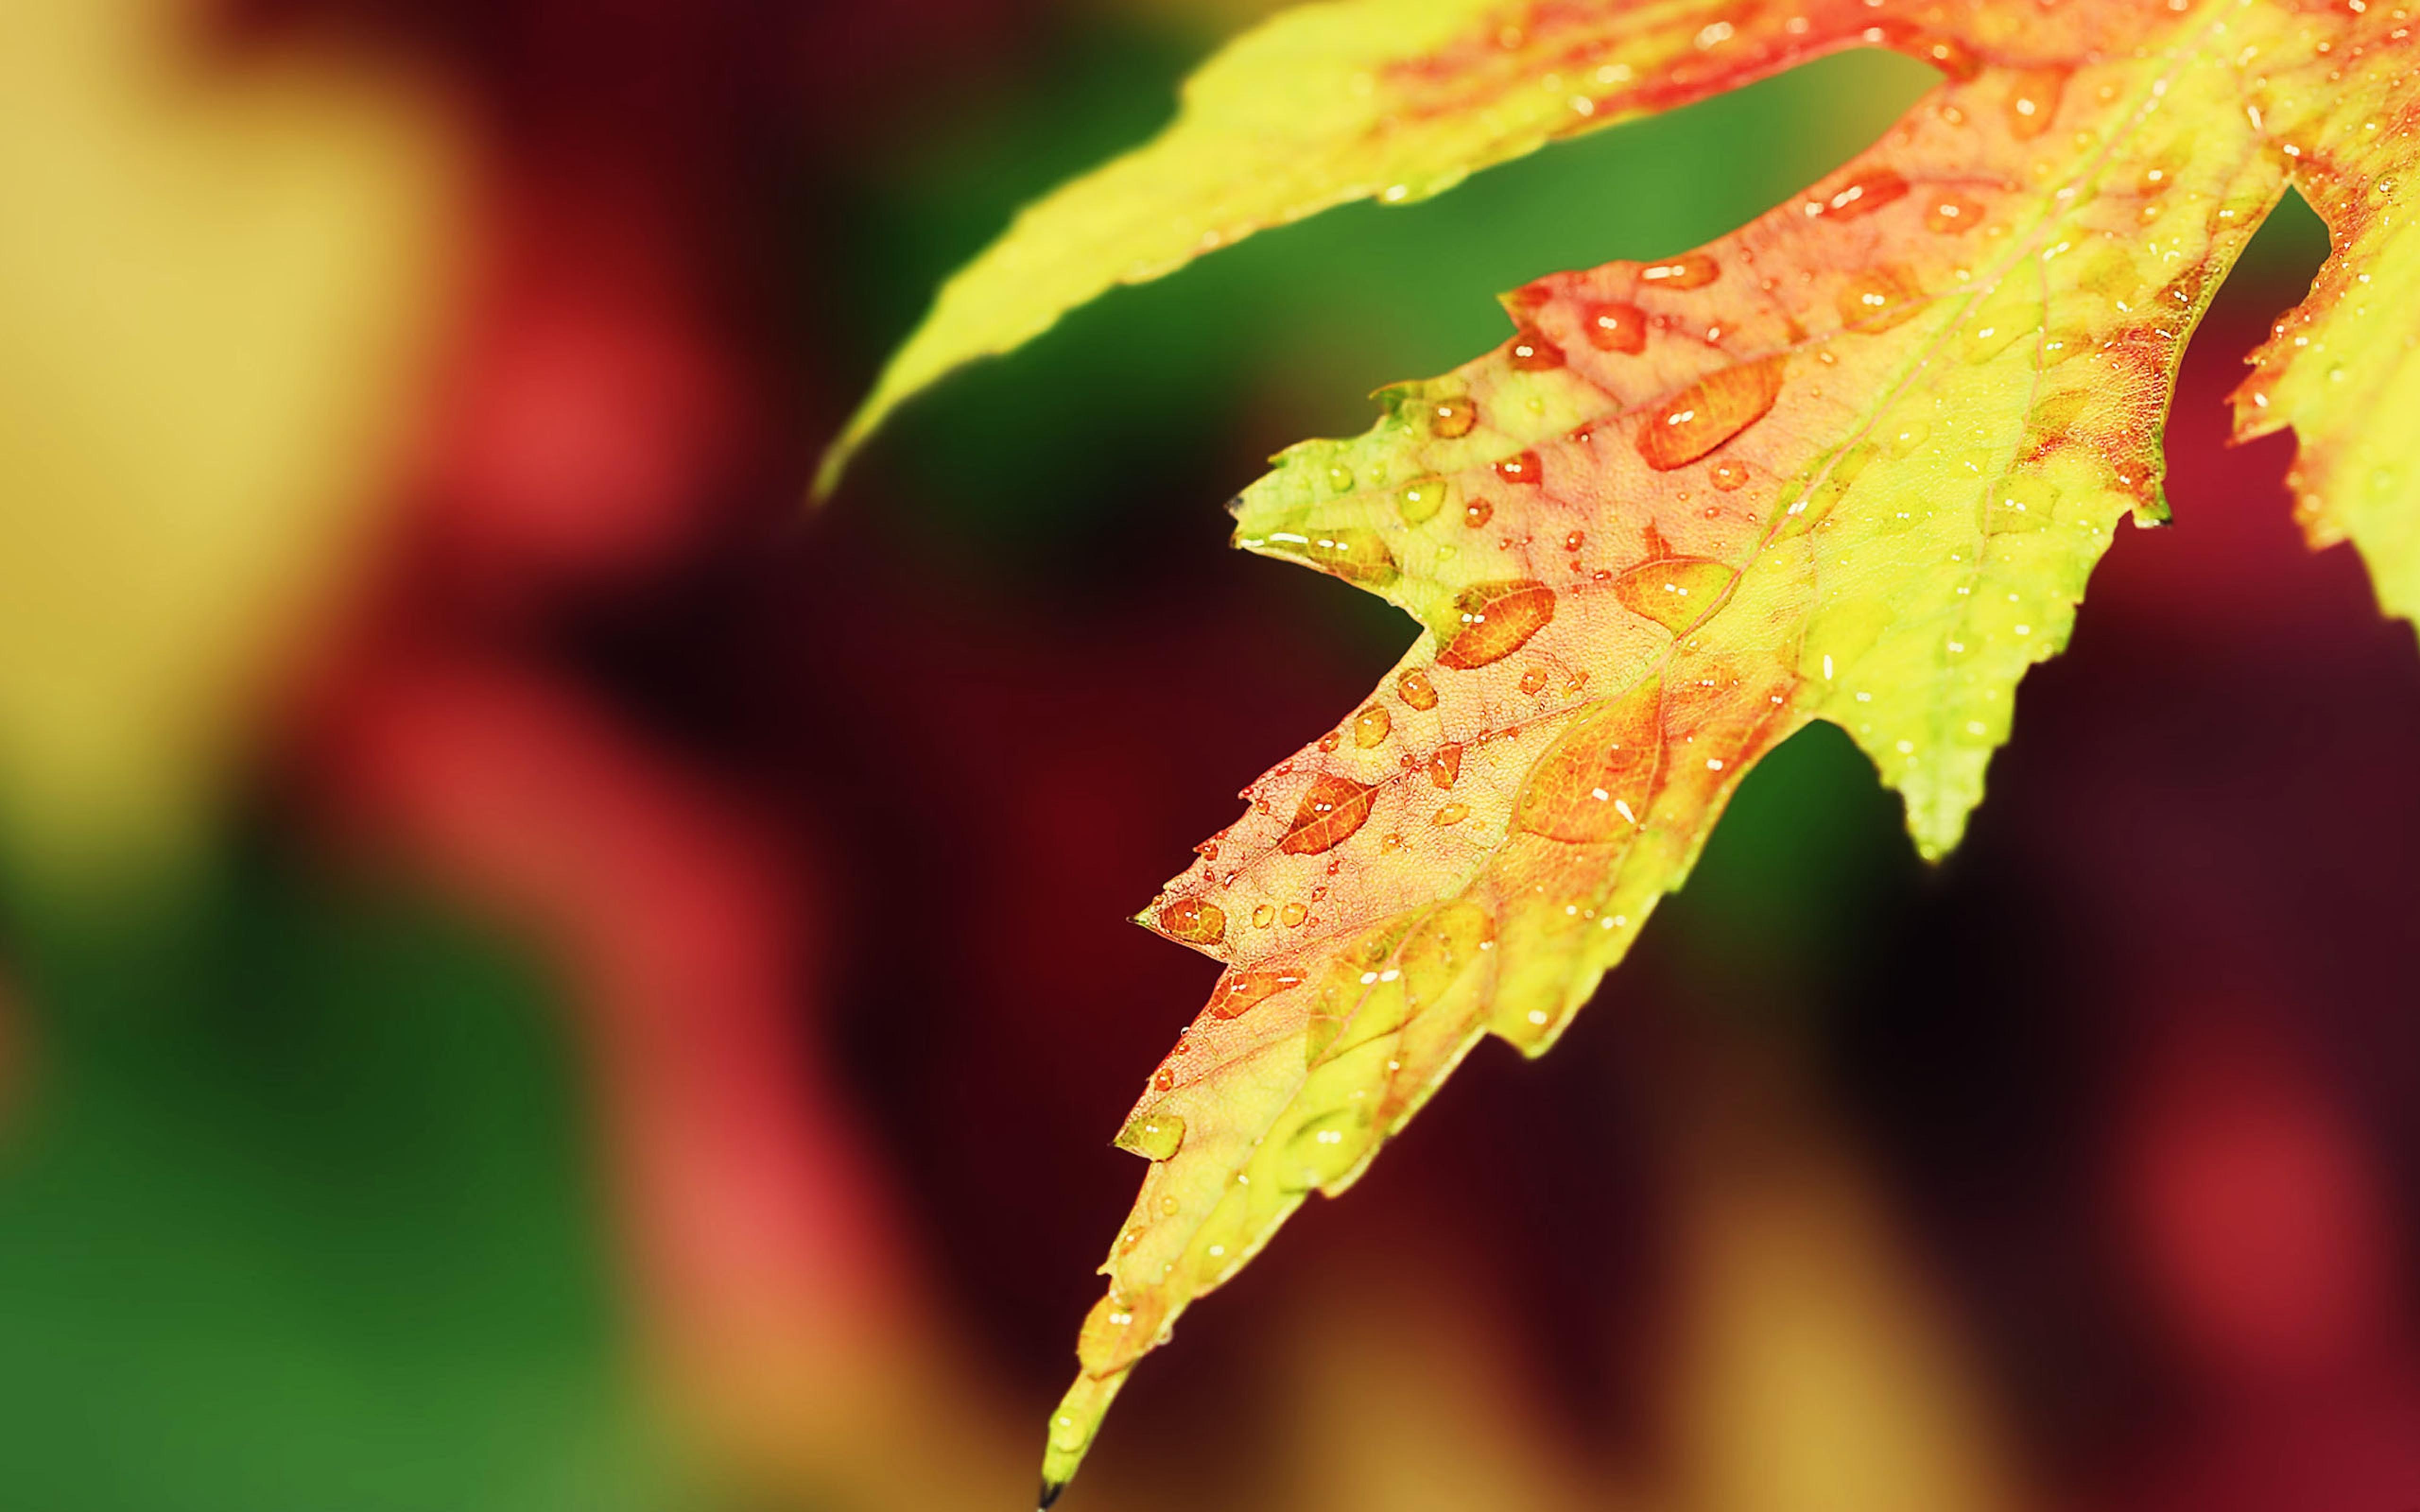 Top Wallpaper Mac Autumn - macro-water-drops-on-a-yellow-autumn-leaf-hd-wallpaper-5120x3200  Snapshot_1001865.jpg